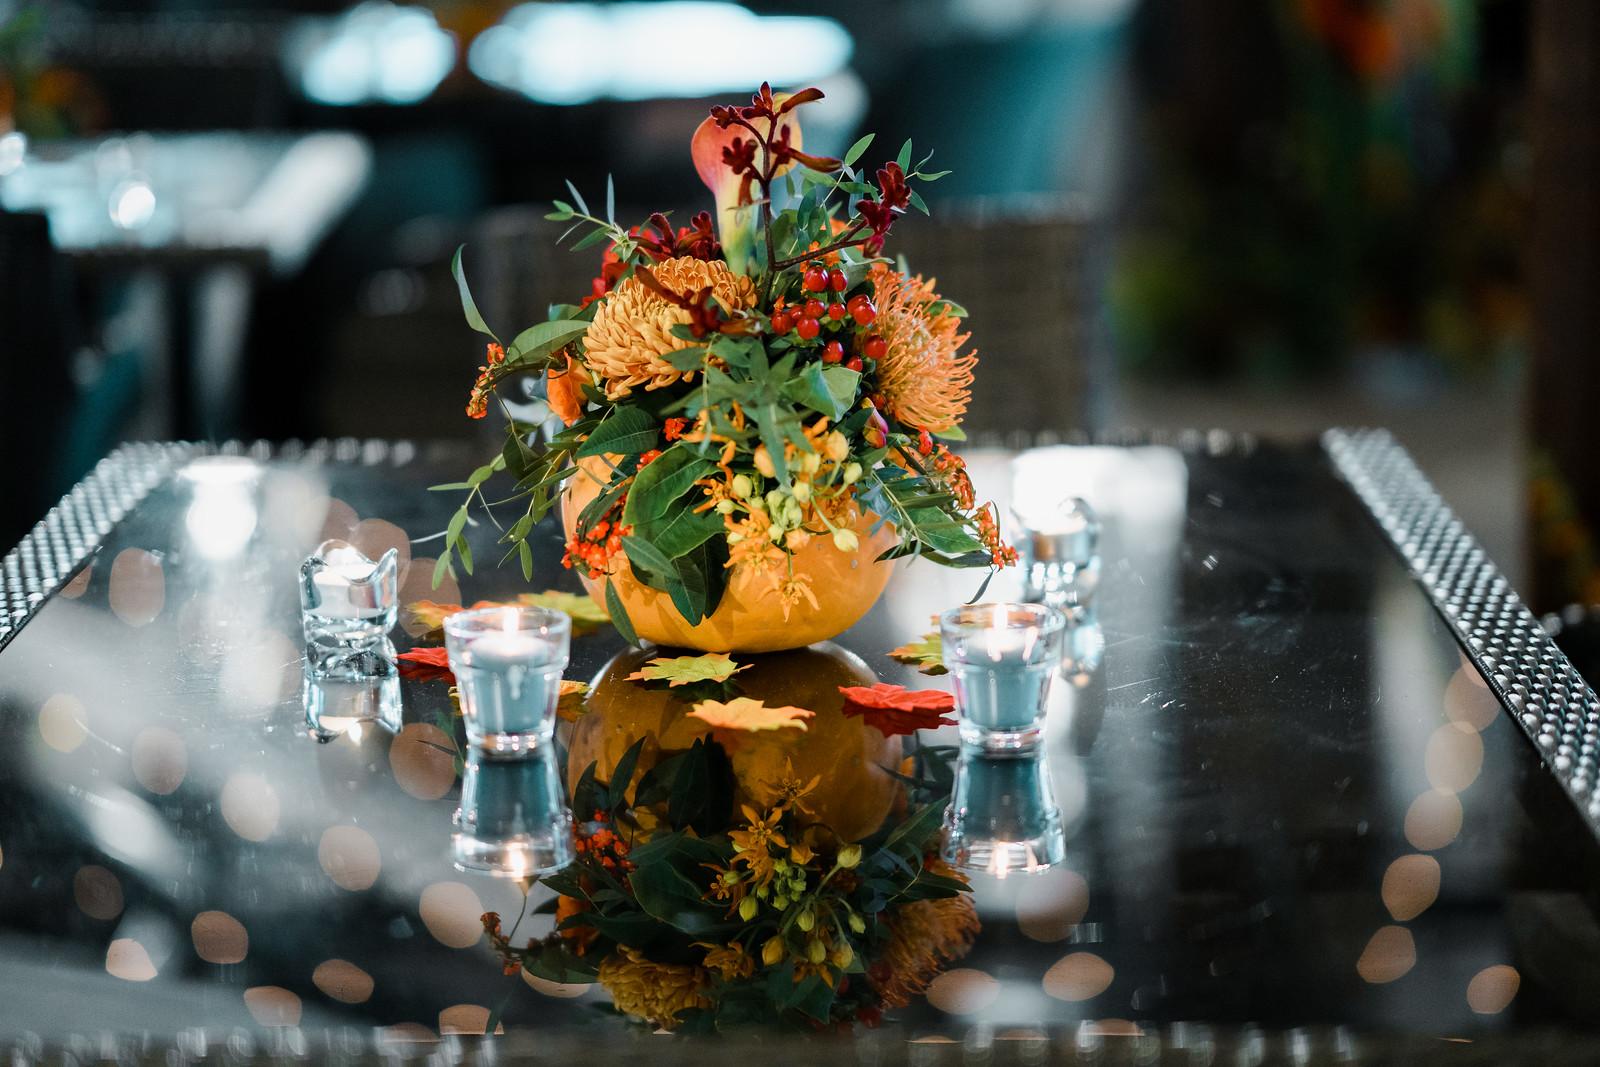 Autumn theme wedding centrepiece design